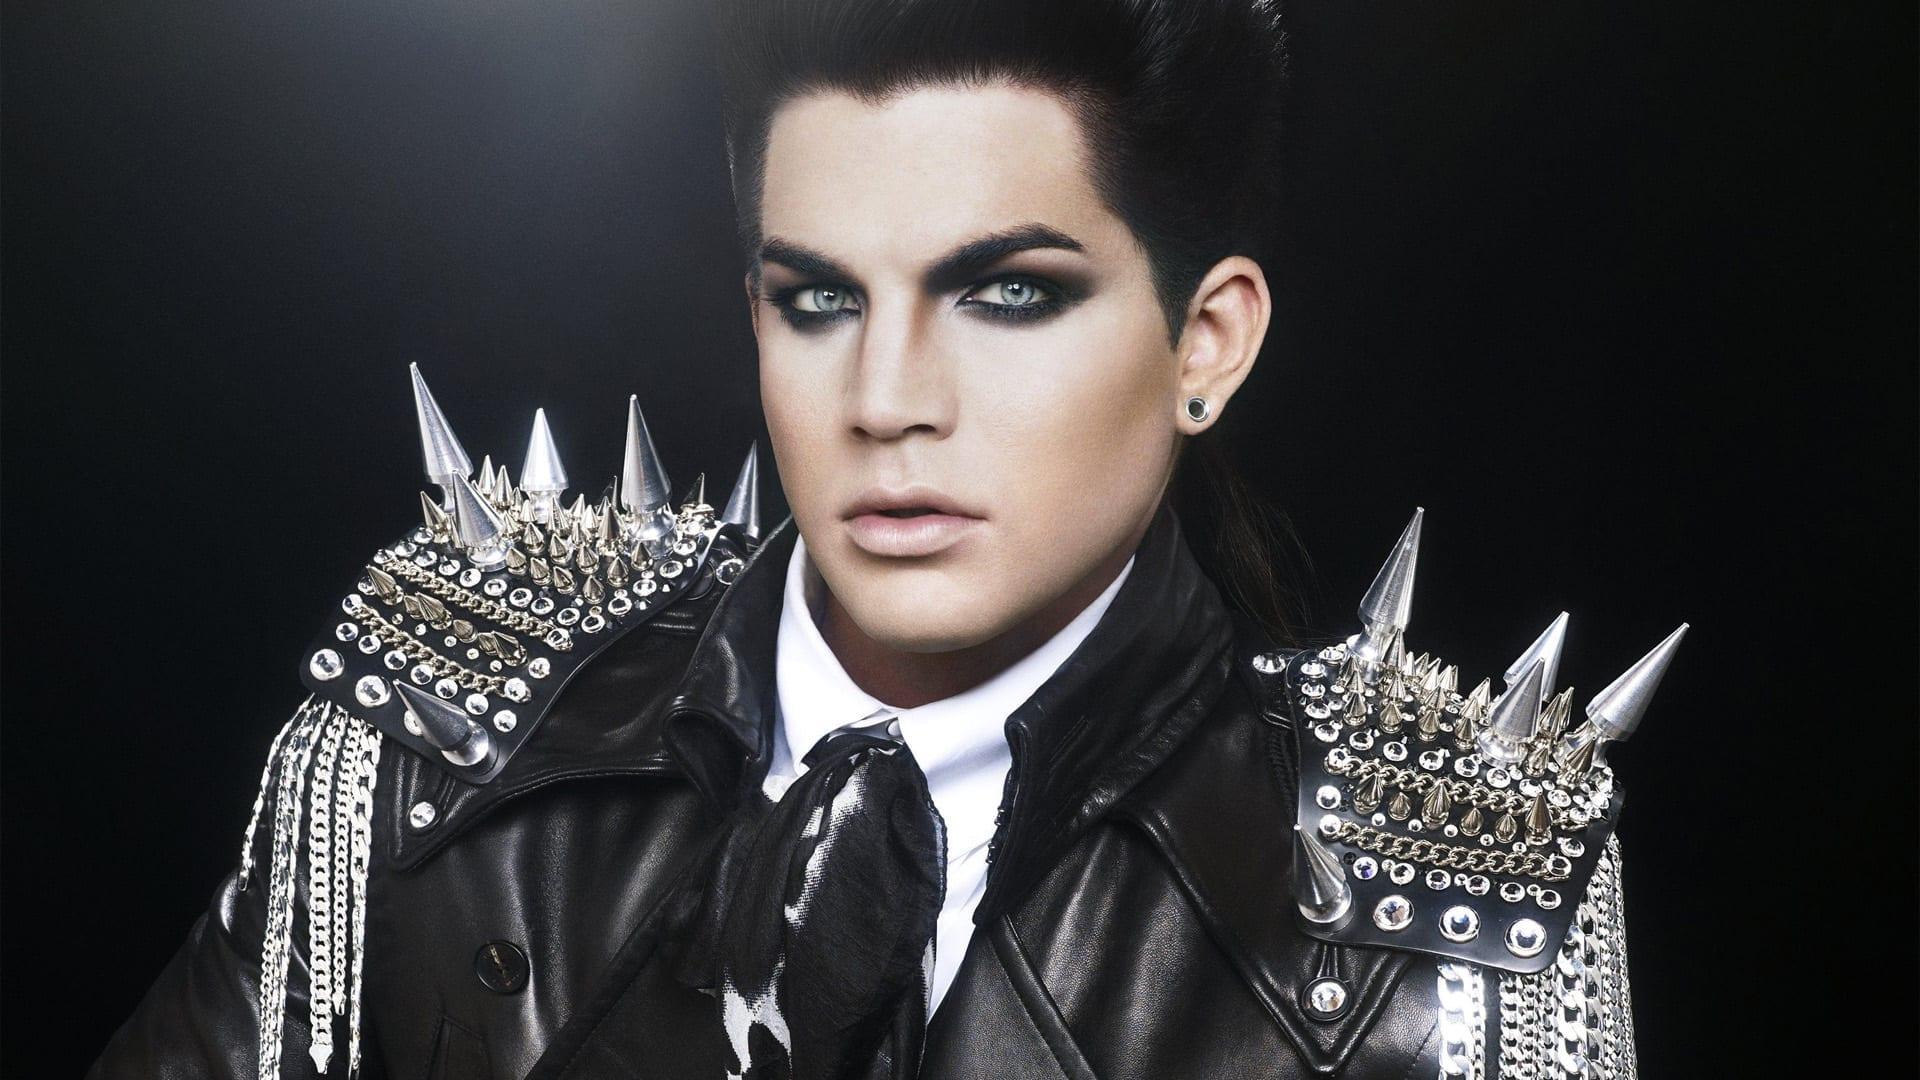 Throwback Thursday: For Your Entertainment // Adam Lambert